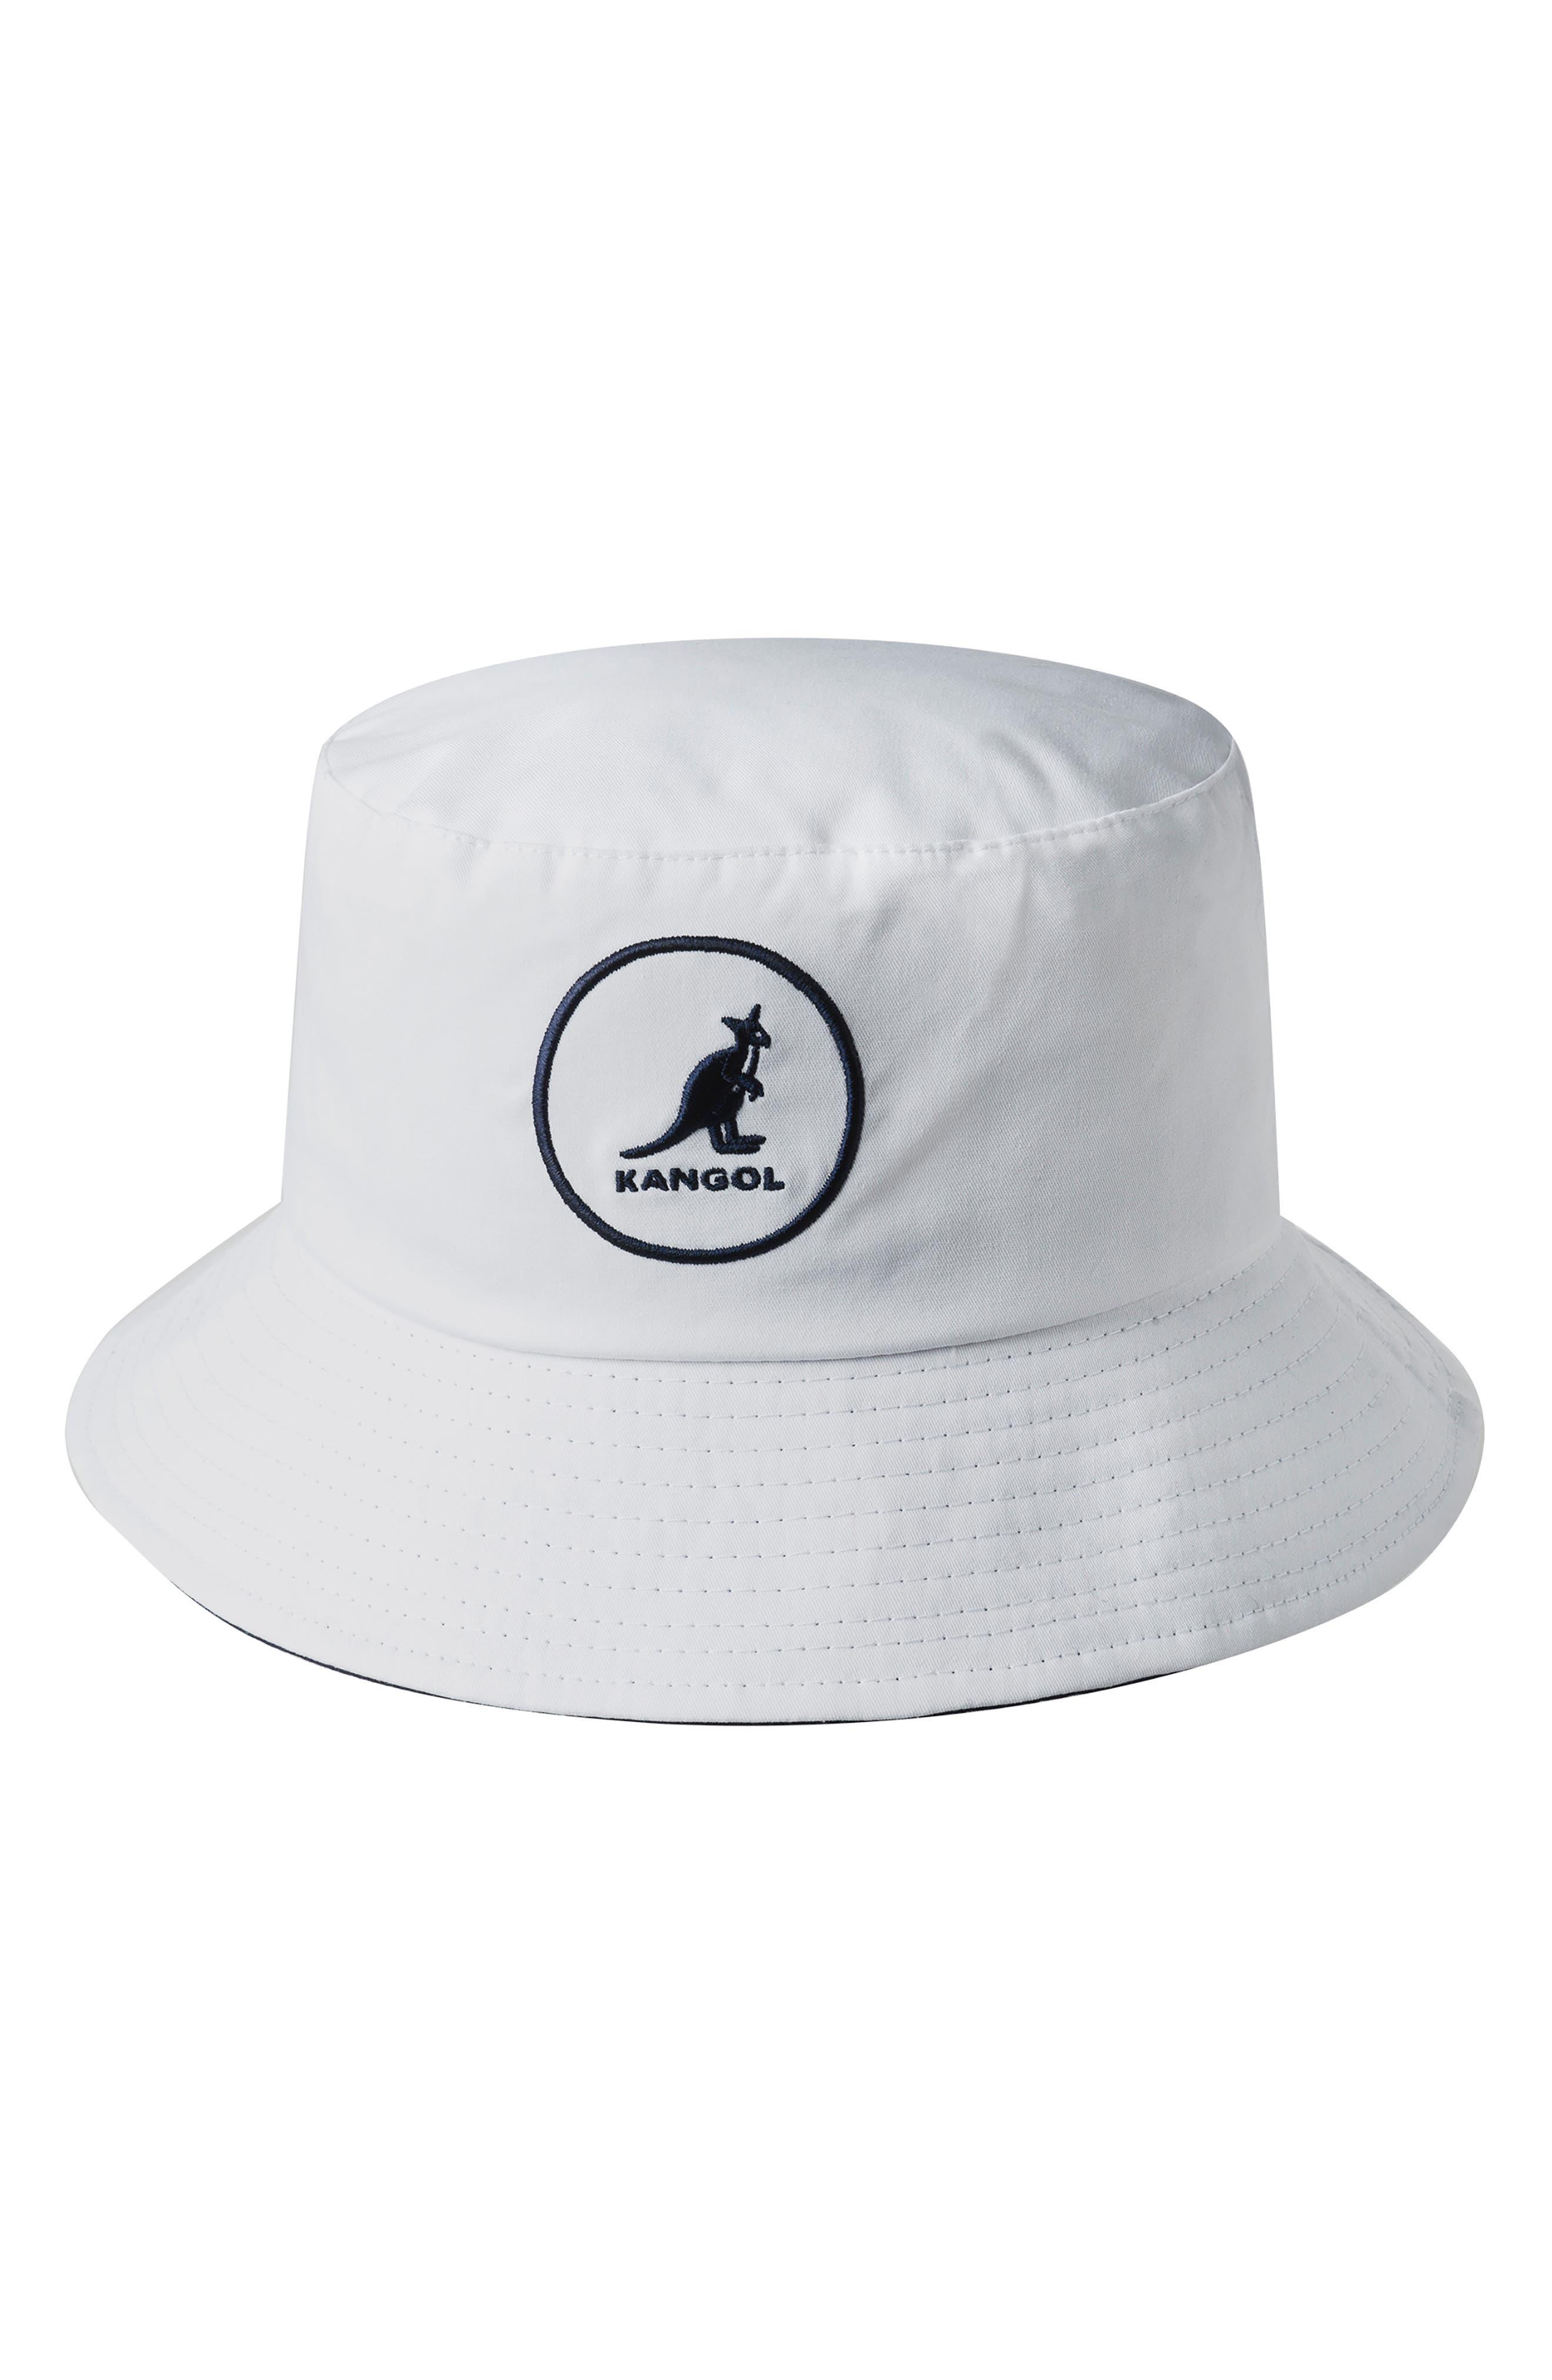 KANGOL Cotton Bucket Hat - White